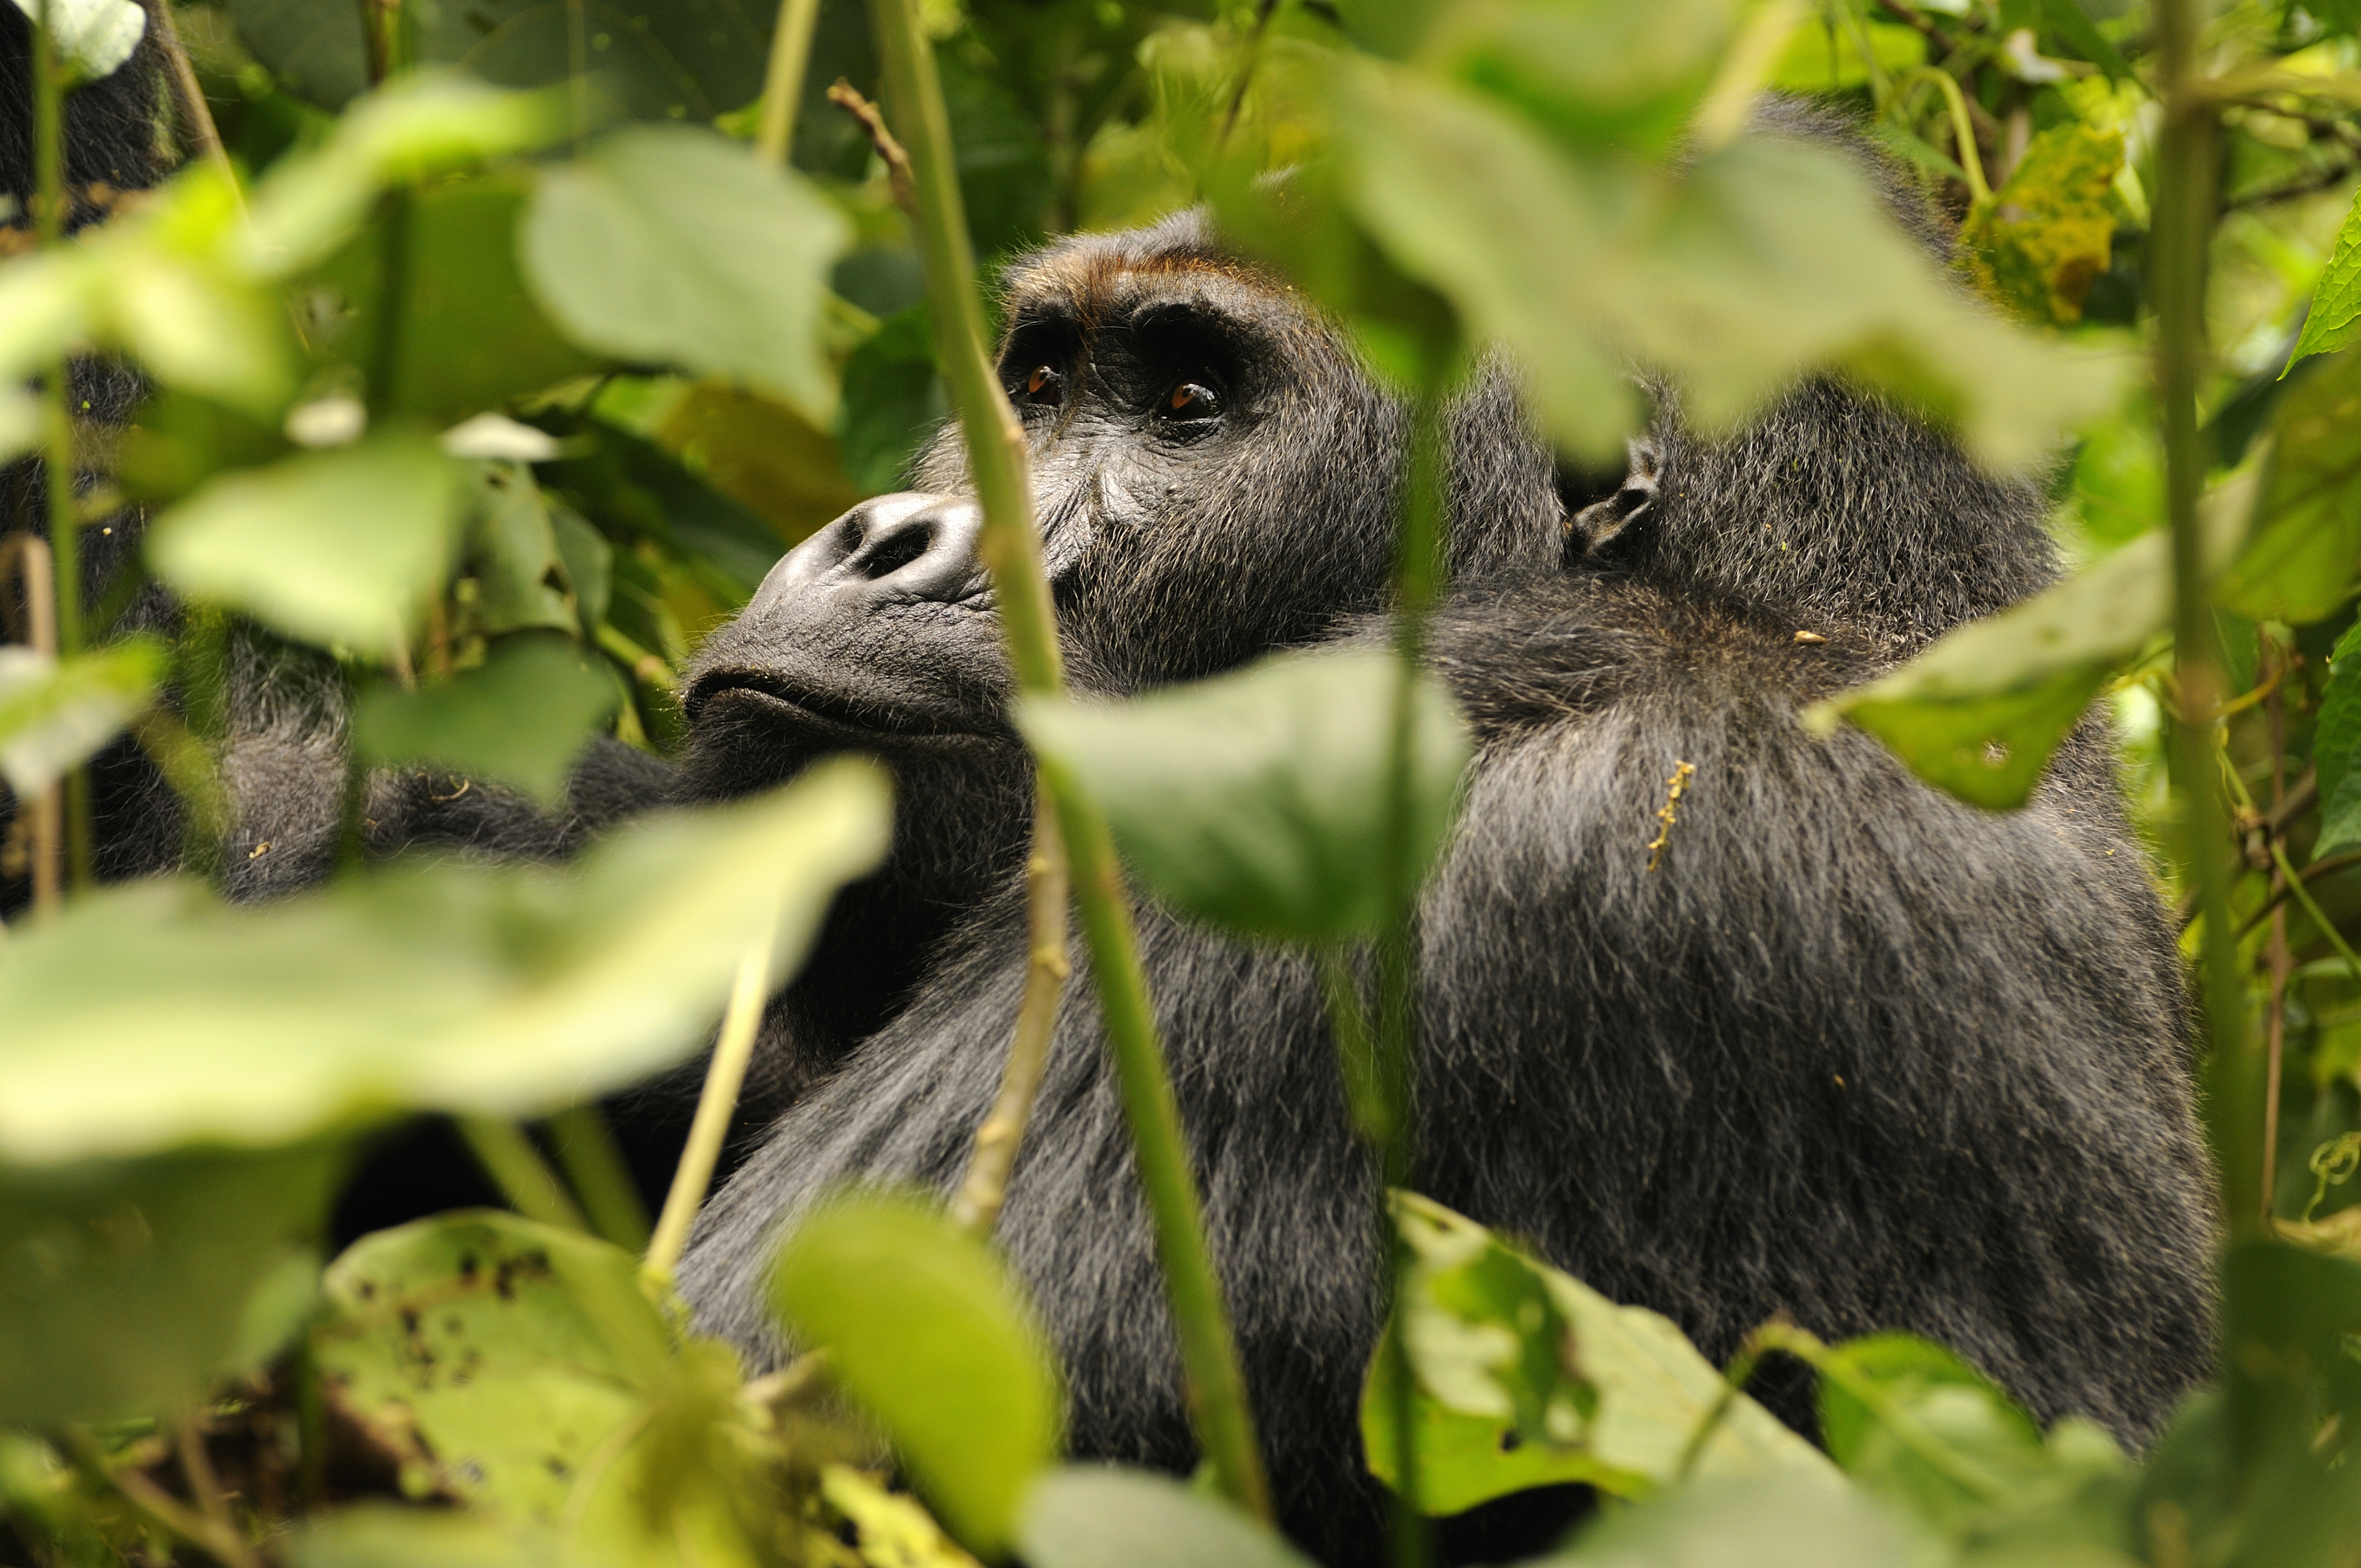 Eastern Lowland Gorilla, a silverback male called Chimanuka in Kahuzi-Biega National Park, Democratic Republic of Congo